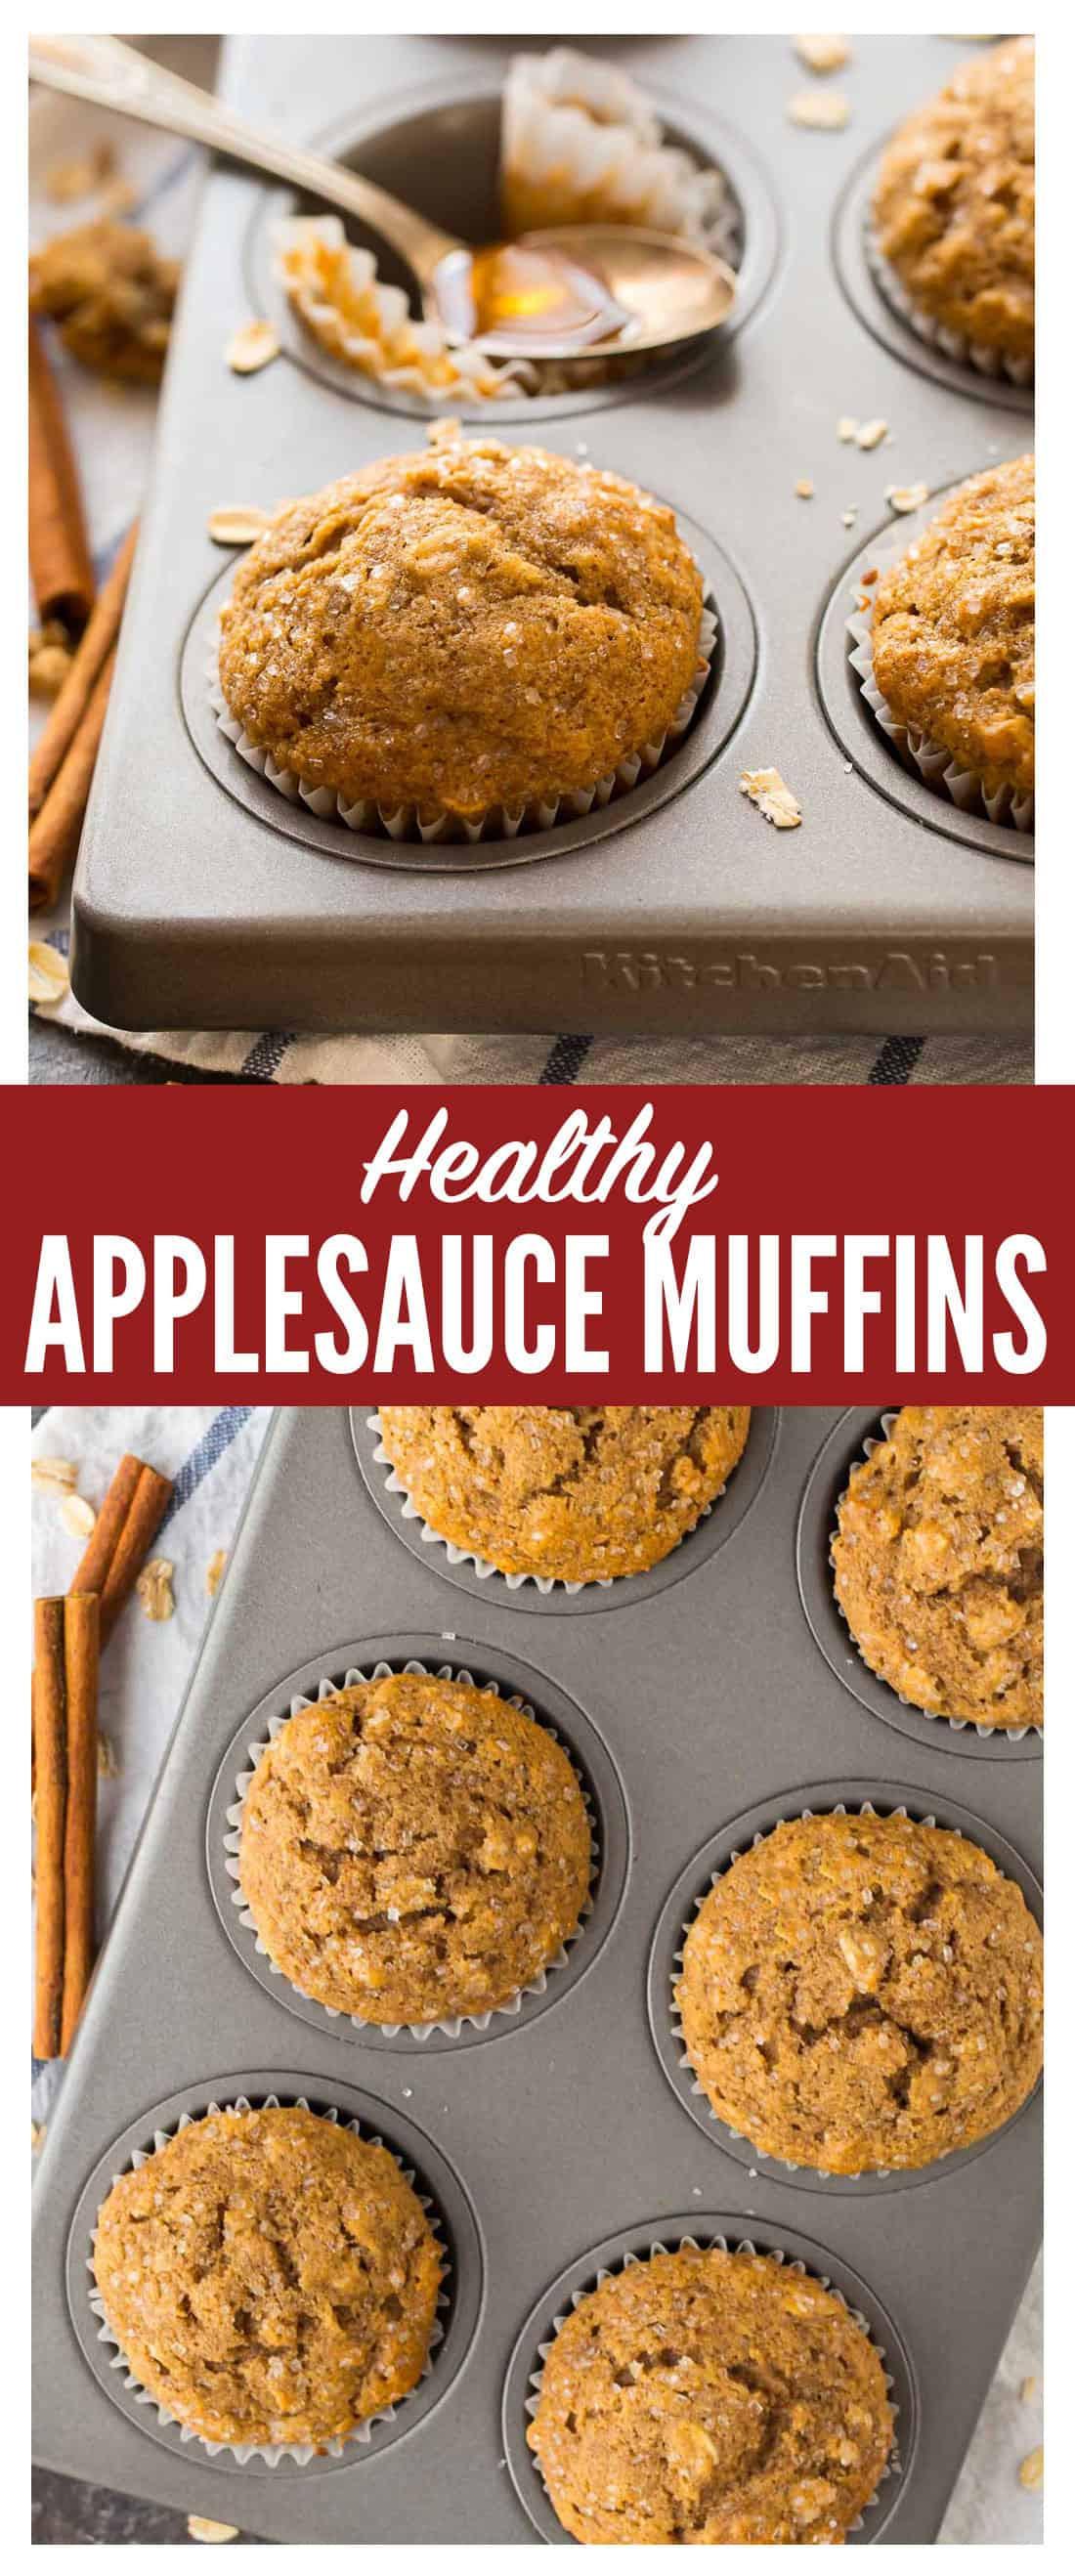 Healthy Oatmeal Muffins Applesauce  Applesauce Muffins